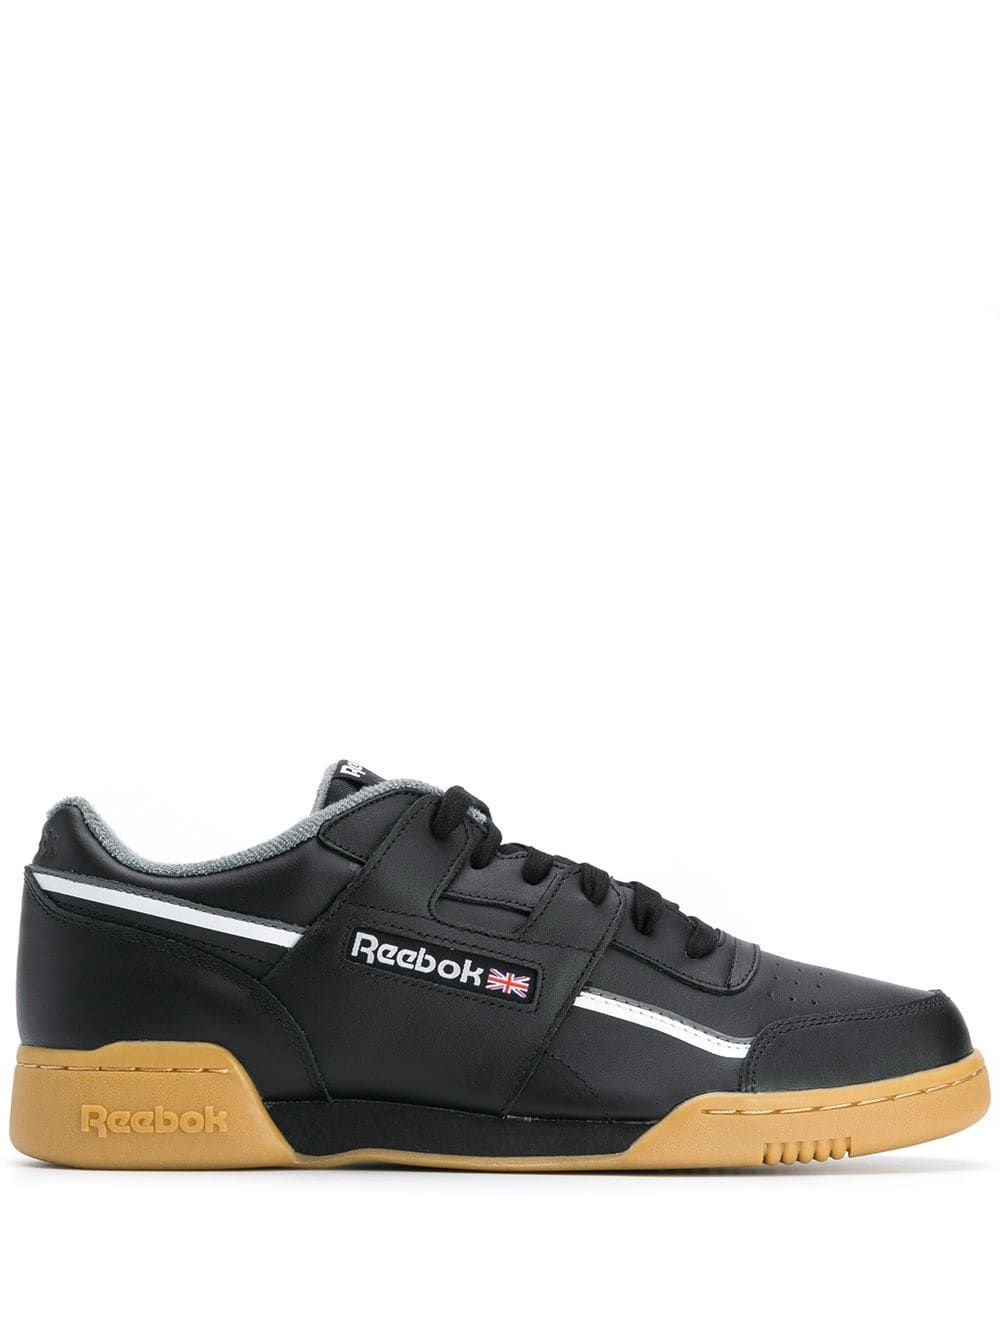 1cc6e0ea2 Reebok Workout Plus MU sneakers - Black in 2019 | Products | Reebok ...